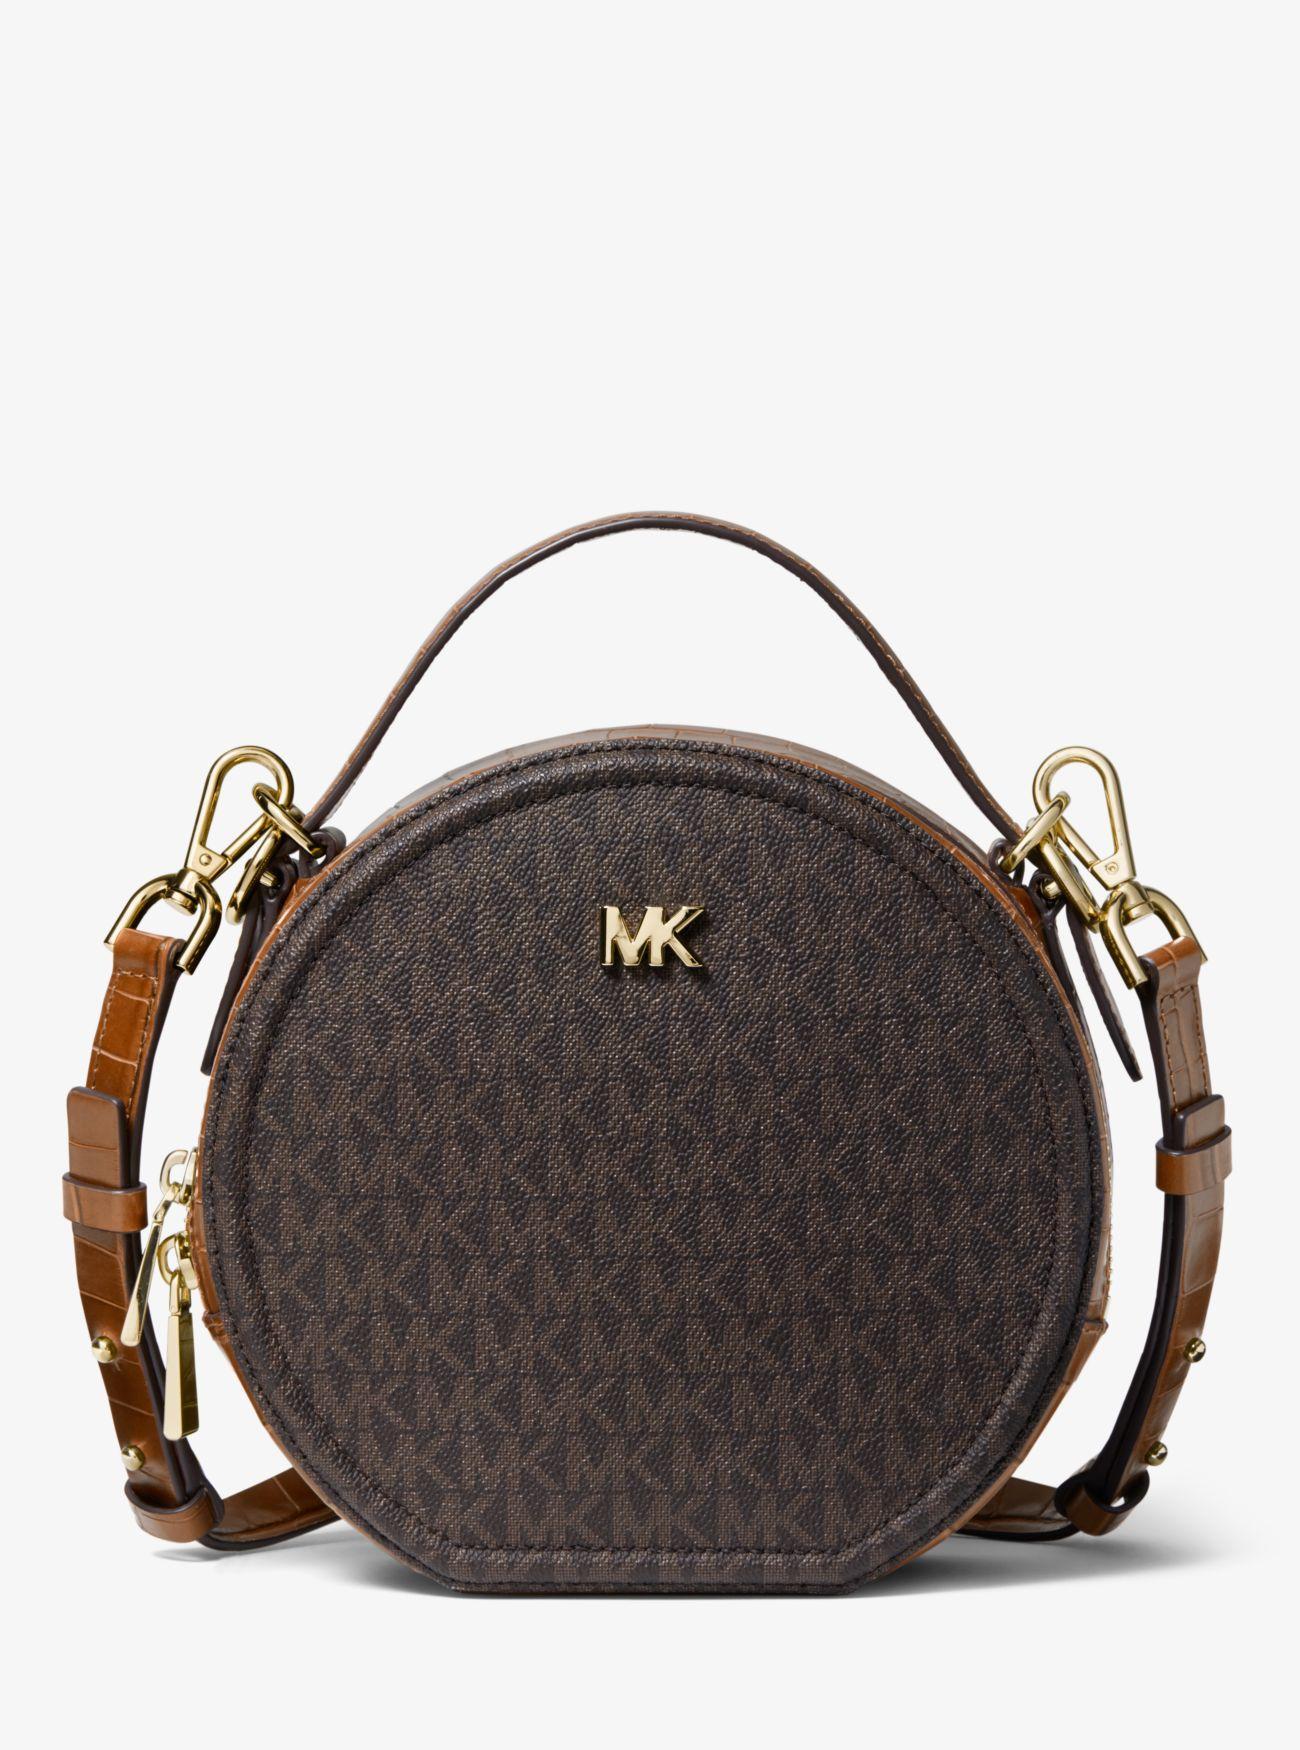 6fcadf90d35a Lyst - Michael Kors Delaney Medium Logo Canteen Crossbody Bag in Brown